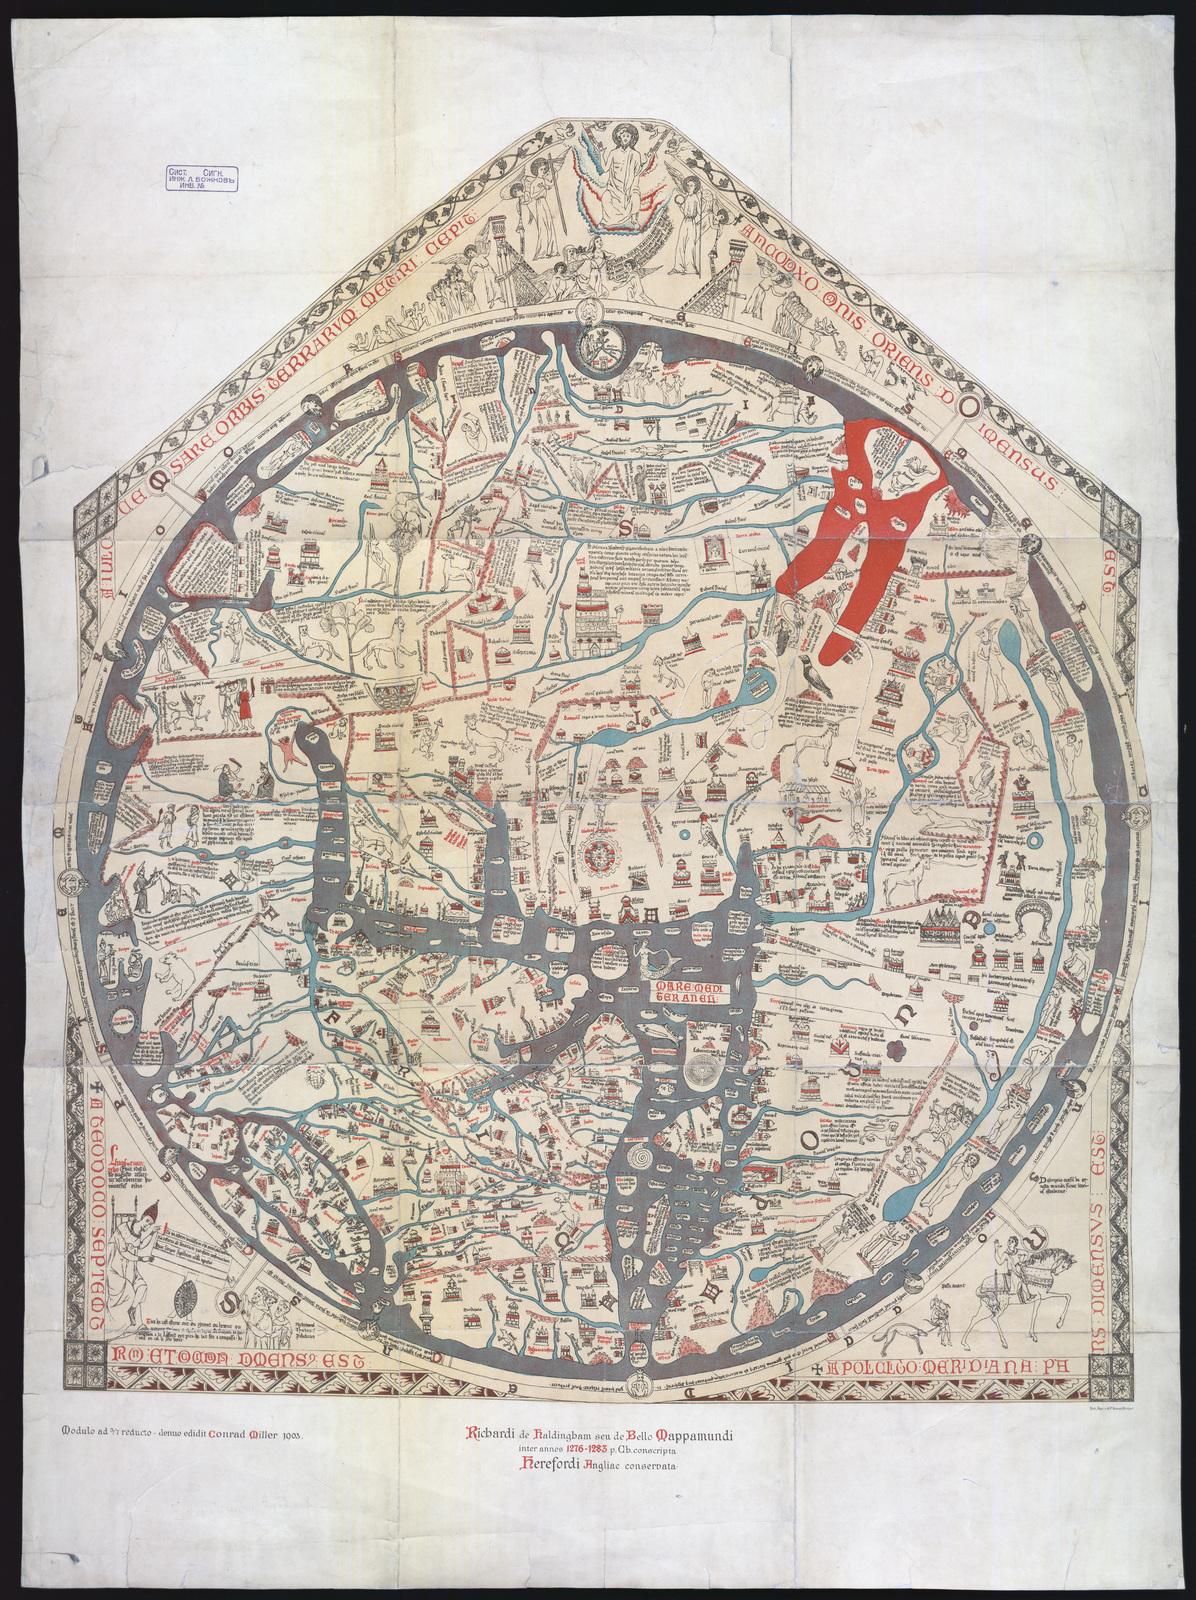 Richardi de Haldingham seu de Bello Mappamundi inter annos 1276-1283 p. Ch.conspirata Herefordi Angliae consrvata : [Херефордска карта]